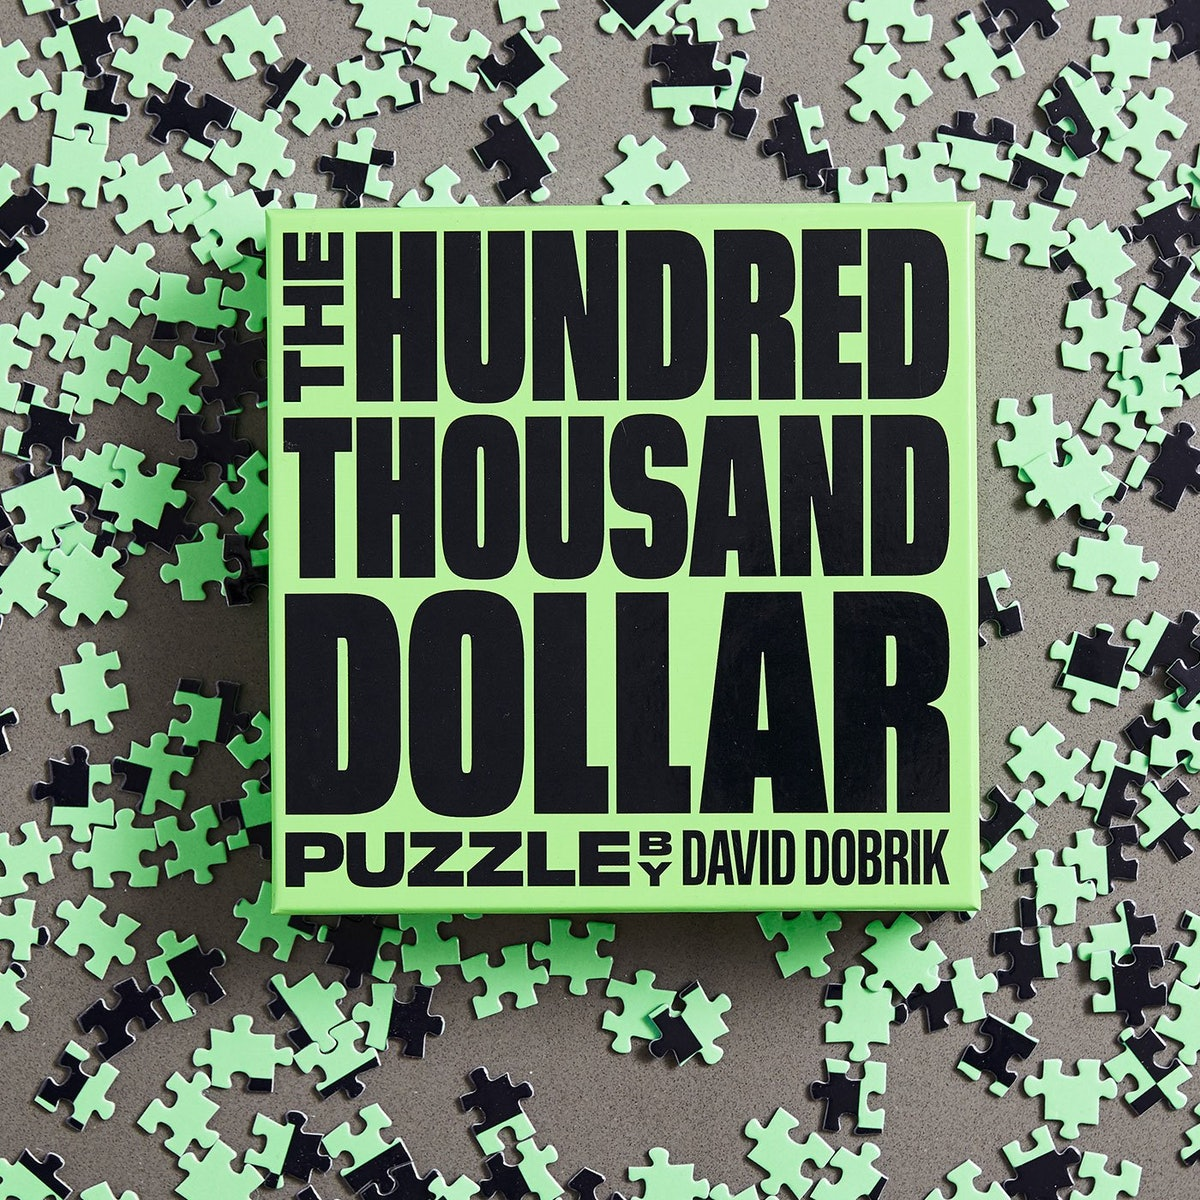 THE HUNDRED THOUSAND DOLLAR PUZZLE by DAVID DOBRIK